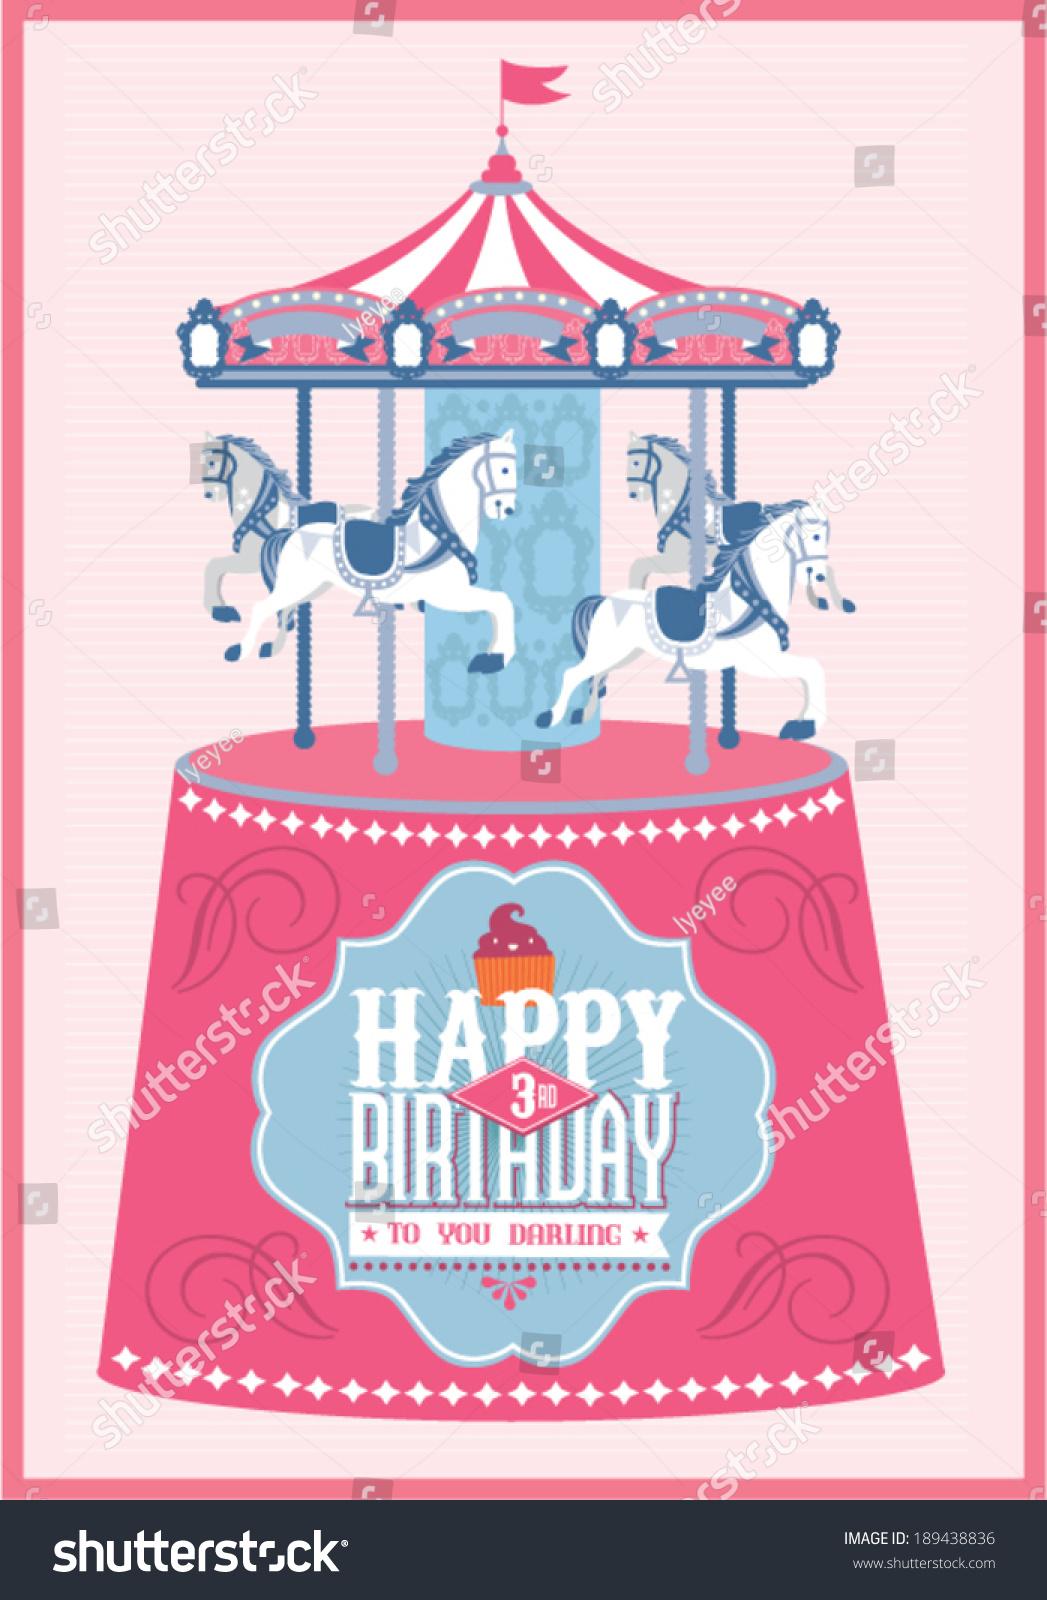 Carouselmerry go round birthday card template stock vector for Merry go round horse template